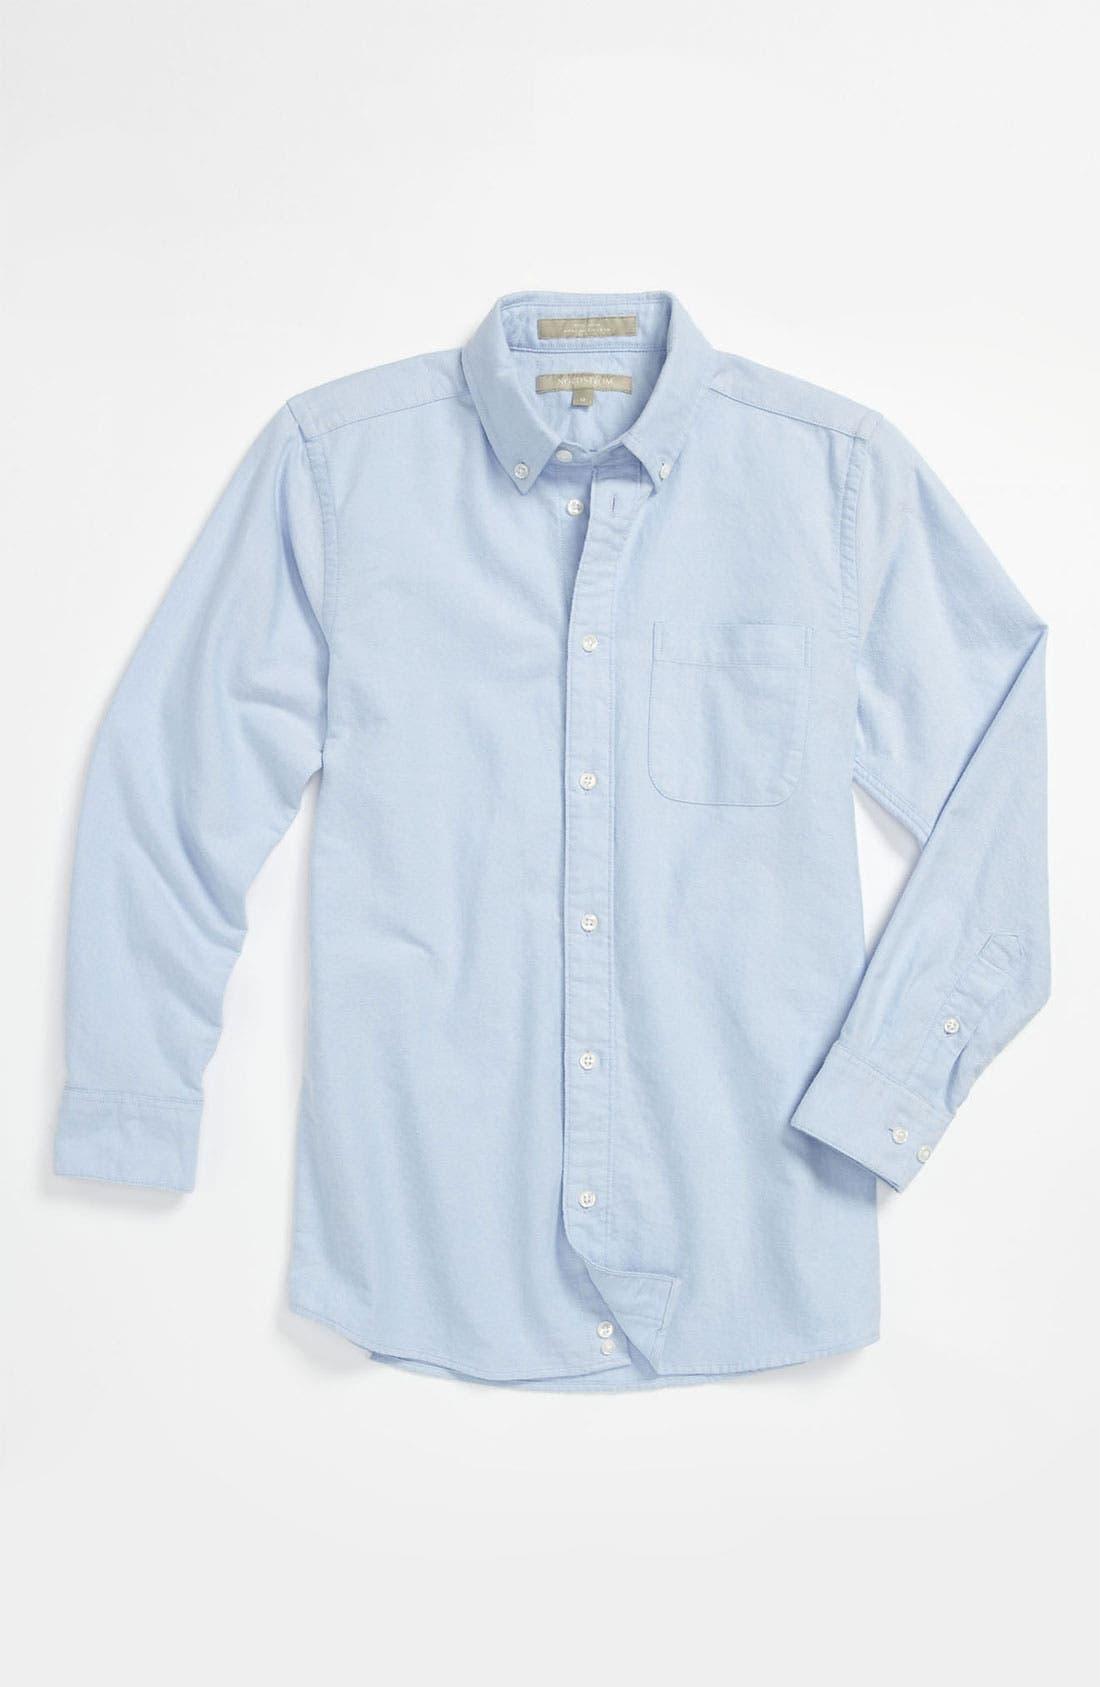 Main Image - Nordstrom 'Michael' Woven Oxford Shirt (Big Boys)